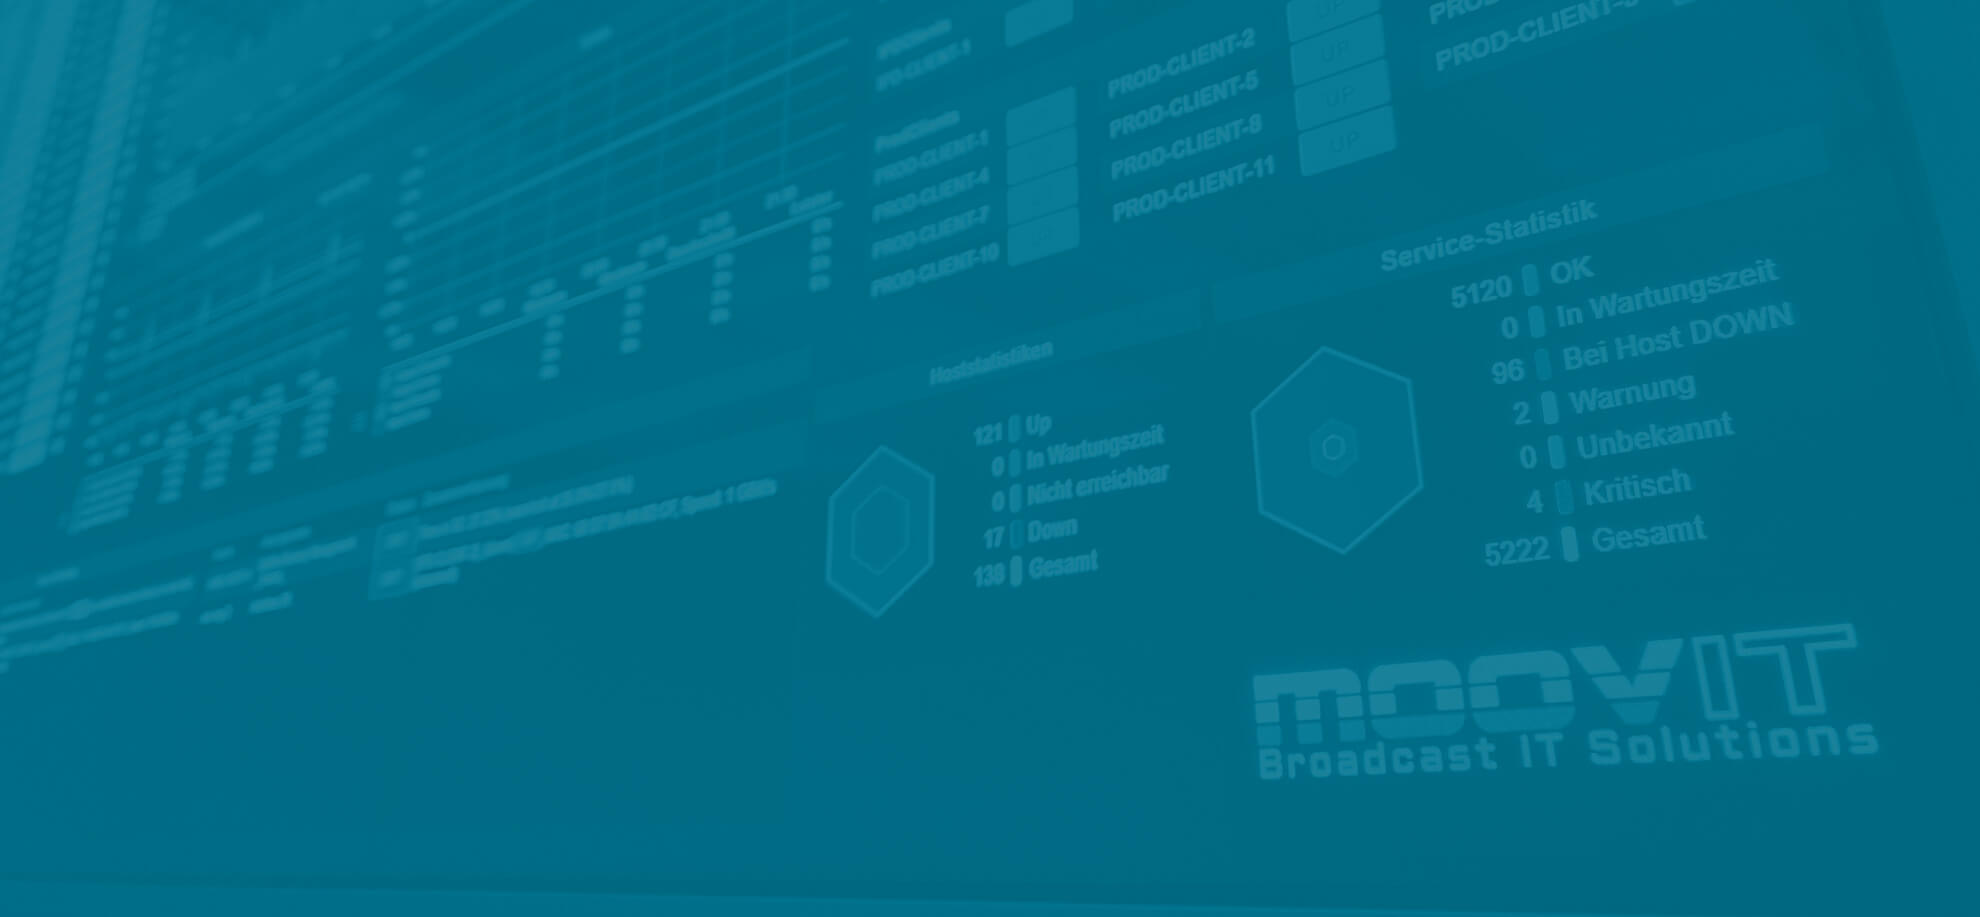 MoovIT dashboard screen